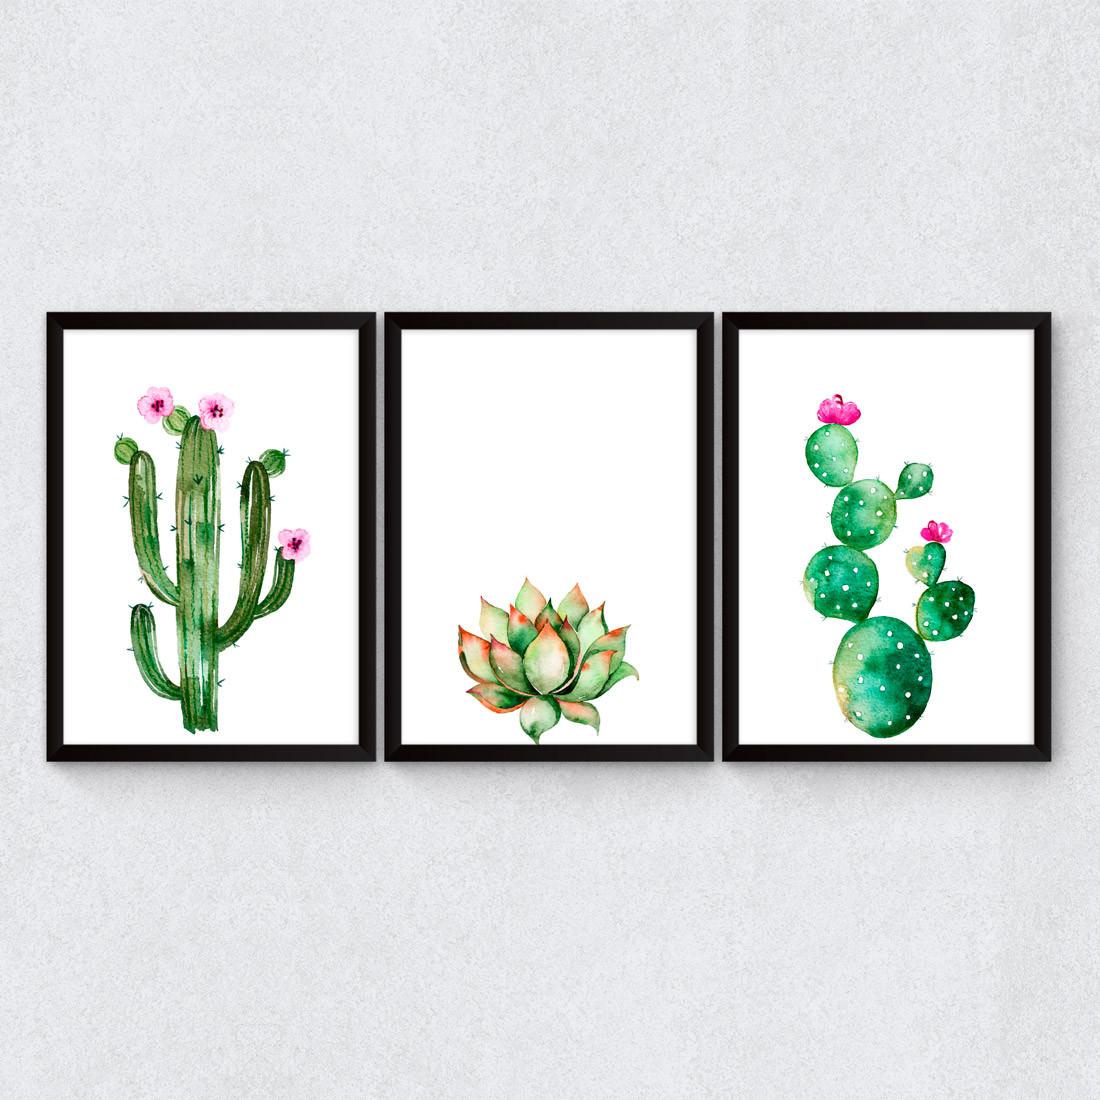 Conjunto de Quadros Decorativos Cactos Floridos